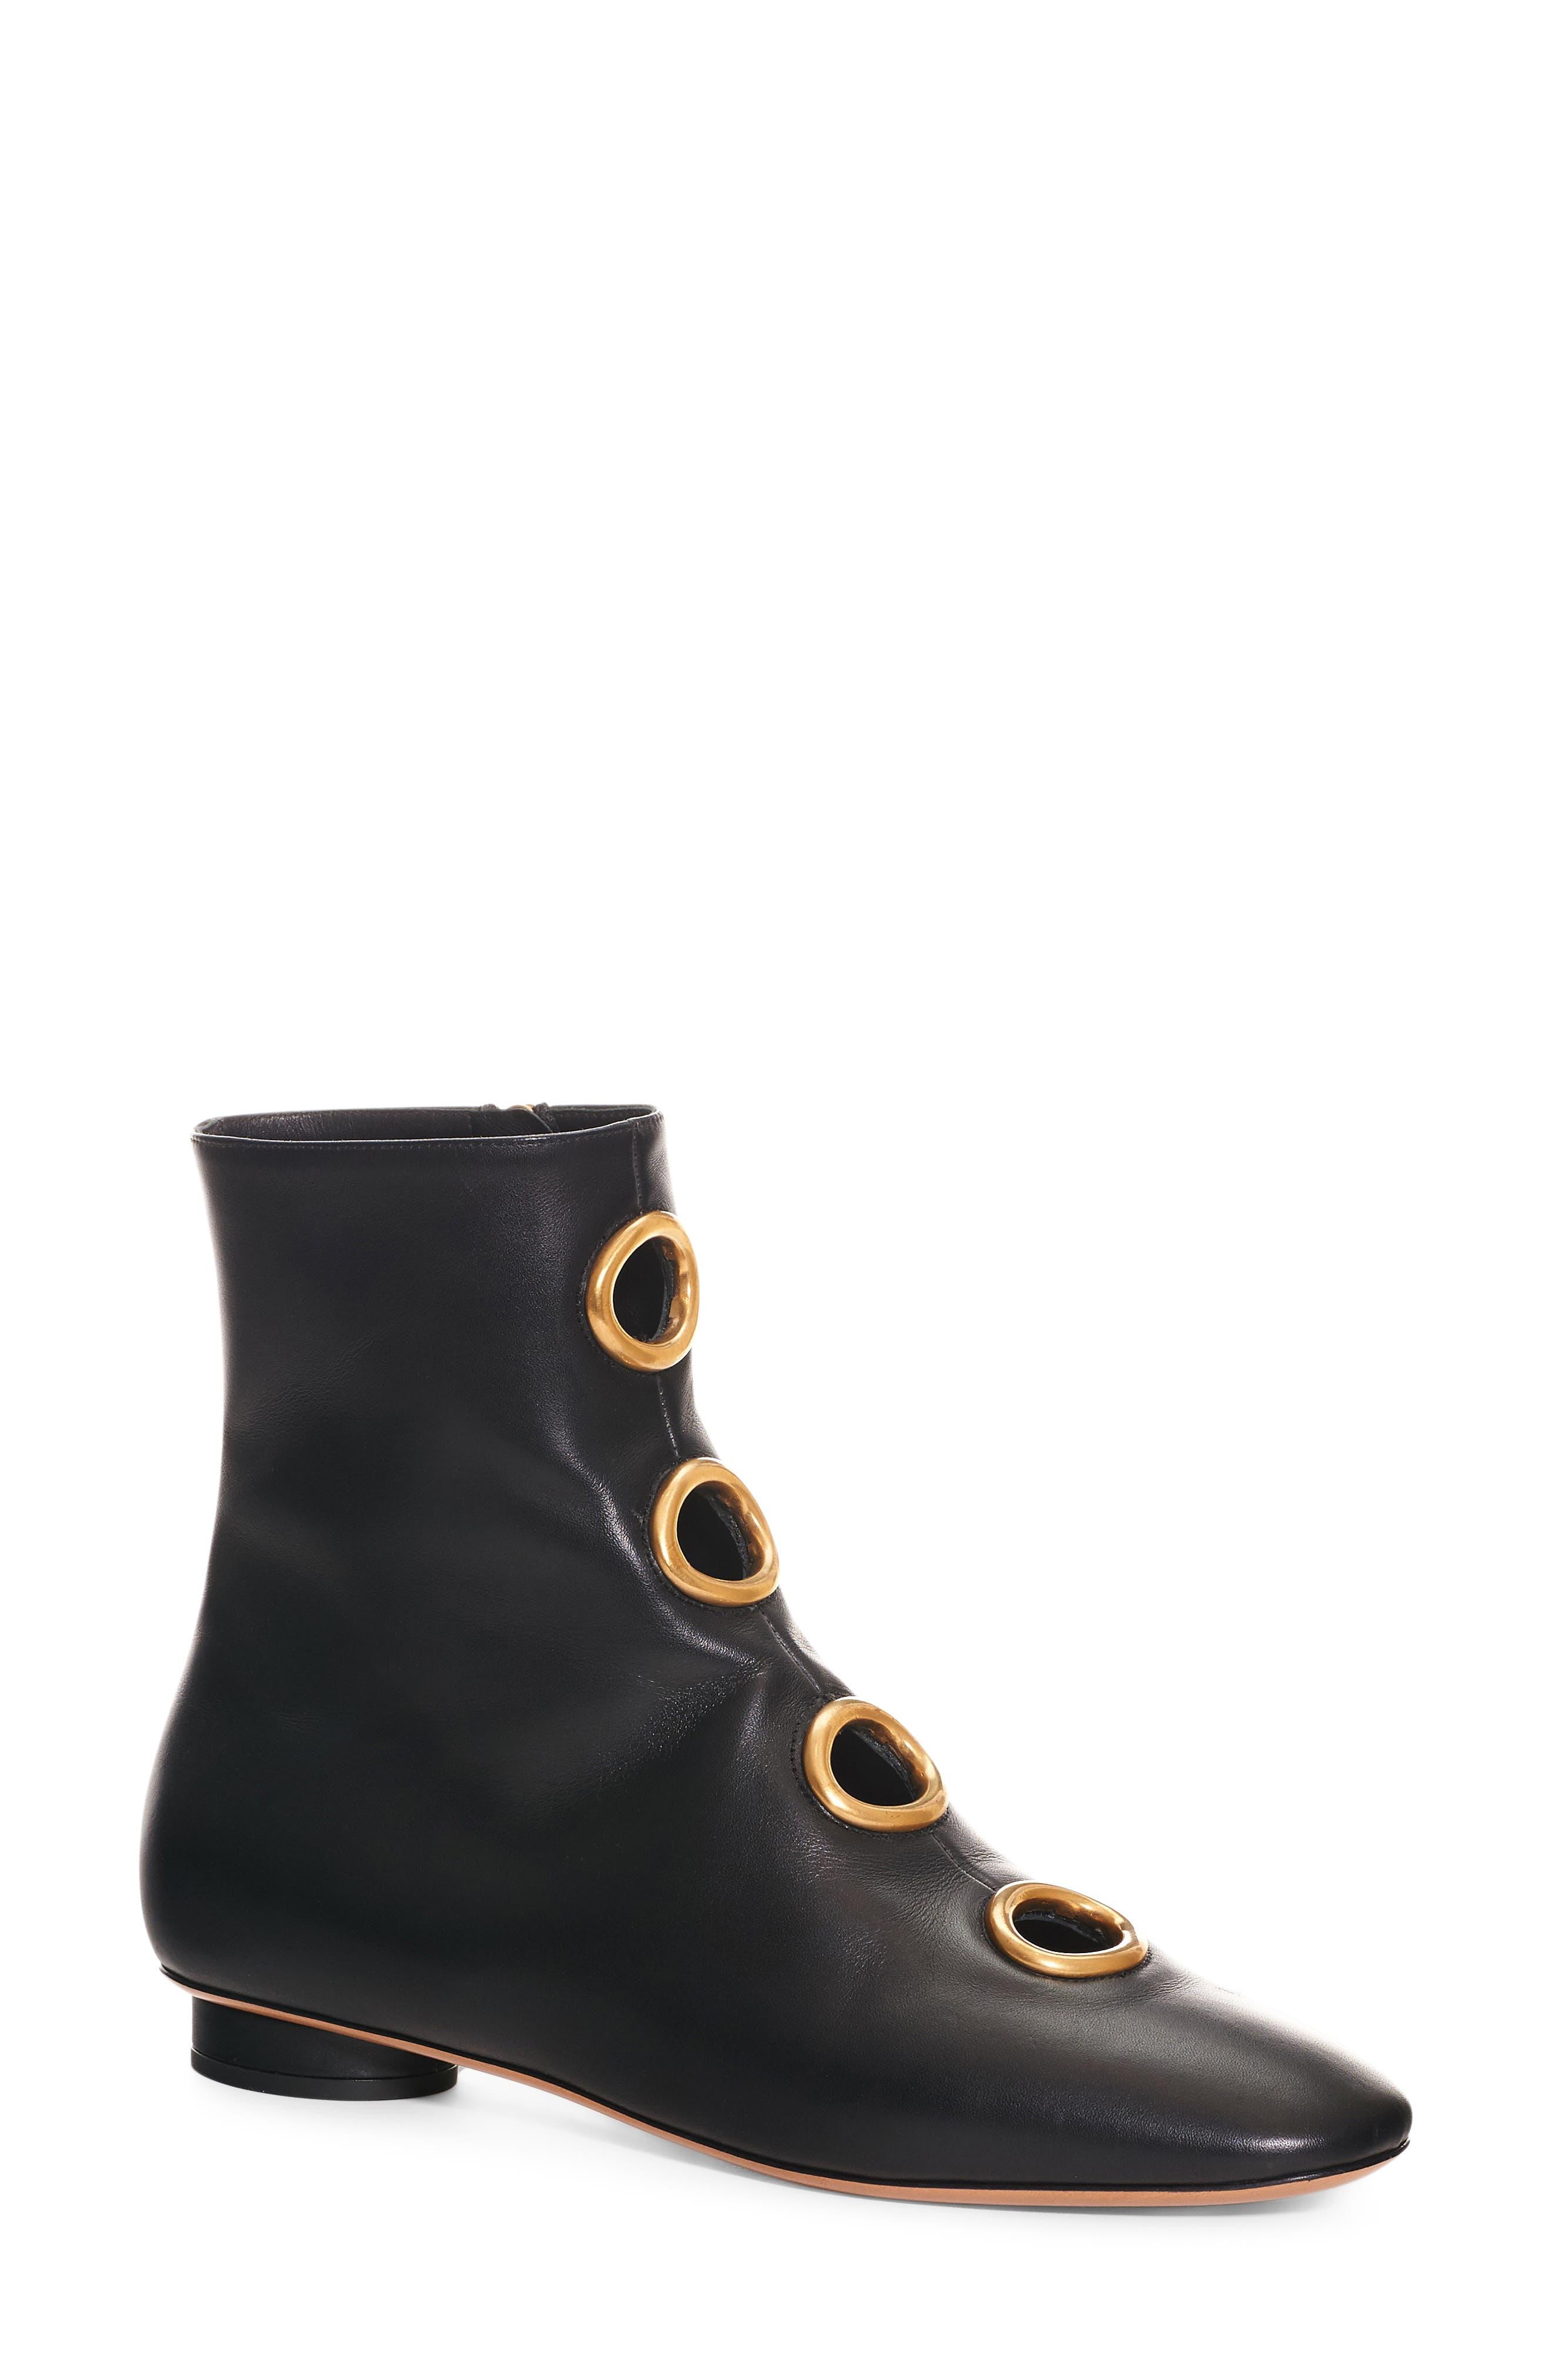 Grommet Boot,                         Main,                         color, Black Leather